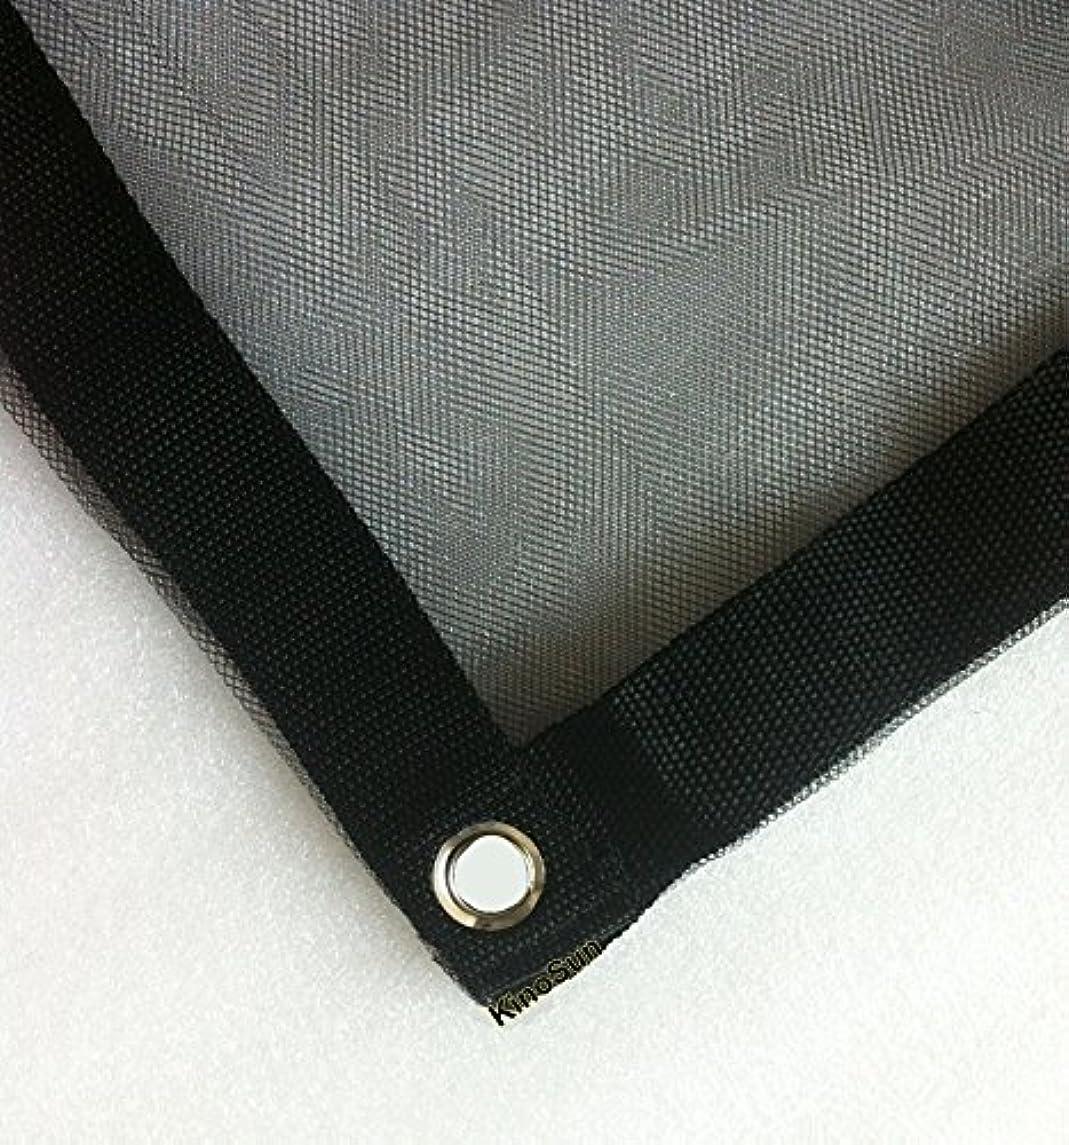 1.8x1.8m 6'x6' 6x6 Double-layer Black Gauze Net Cloth for light weakening No Seam